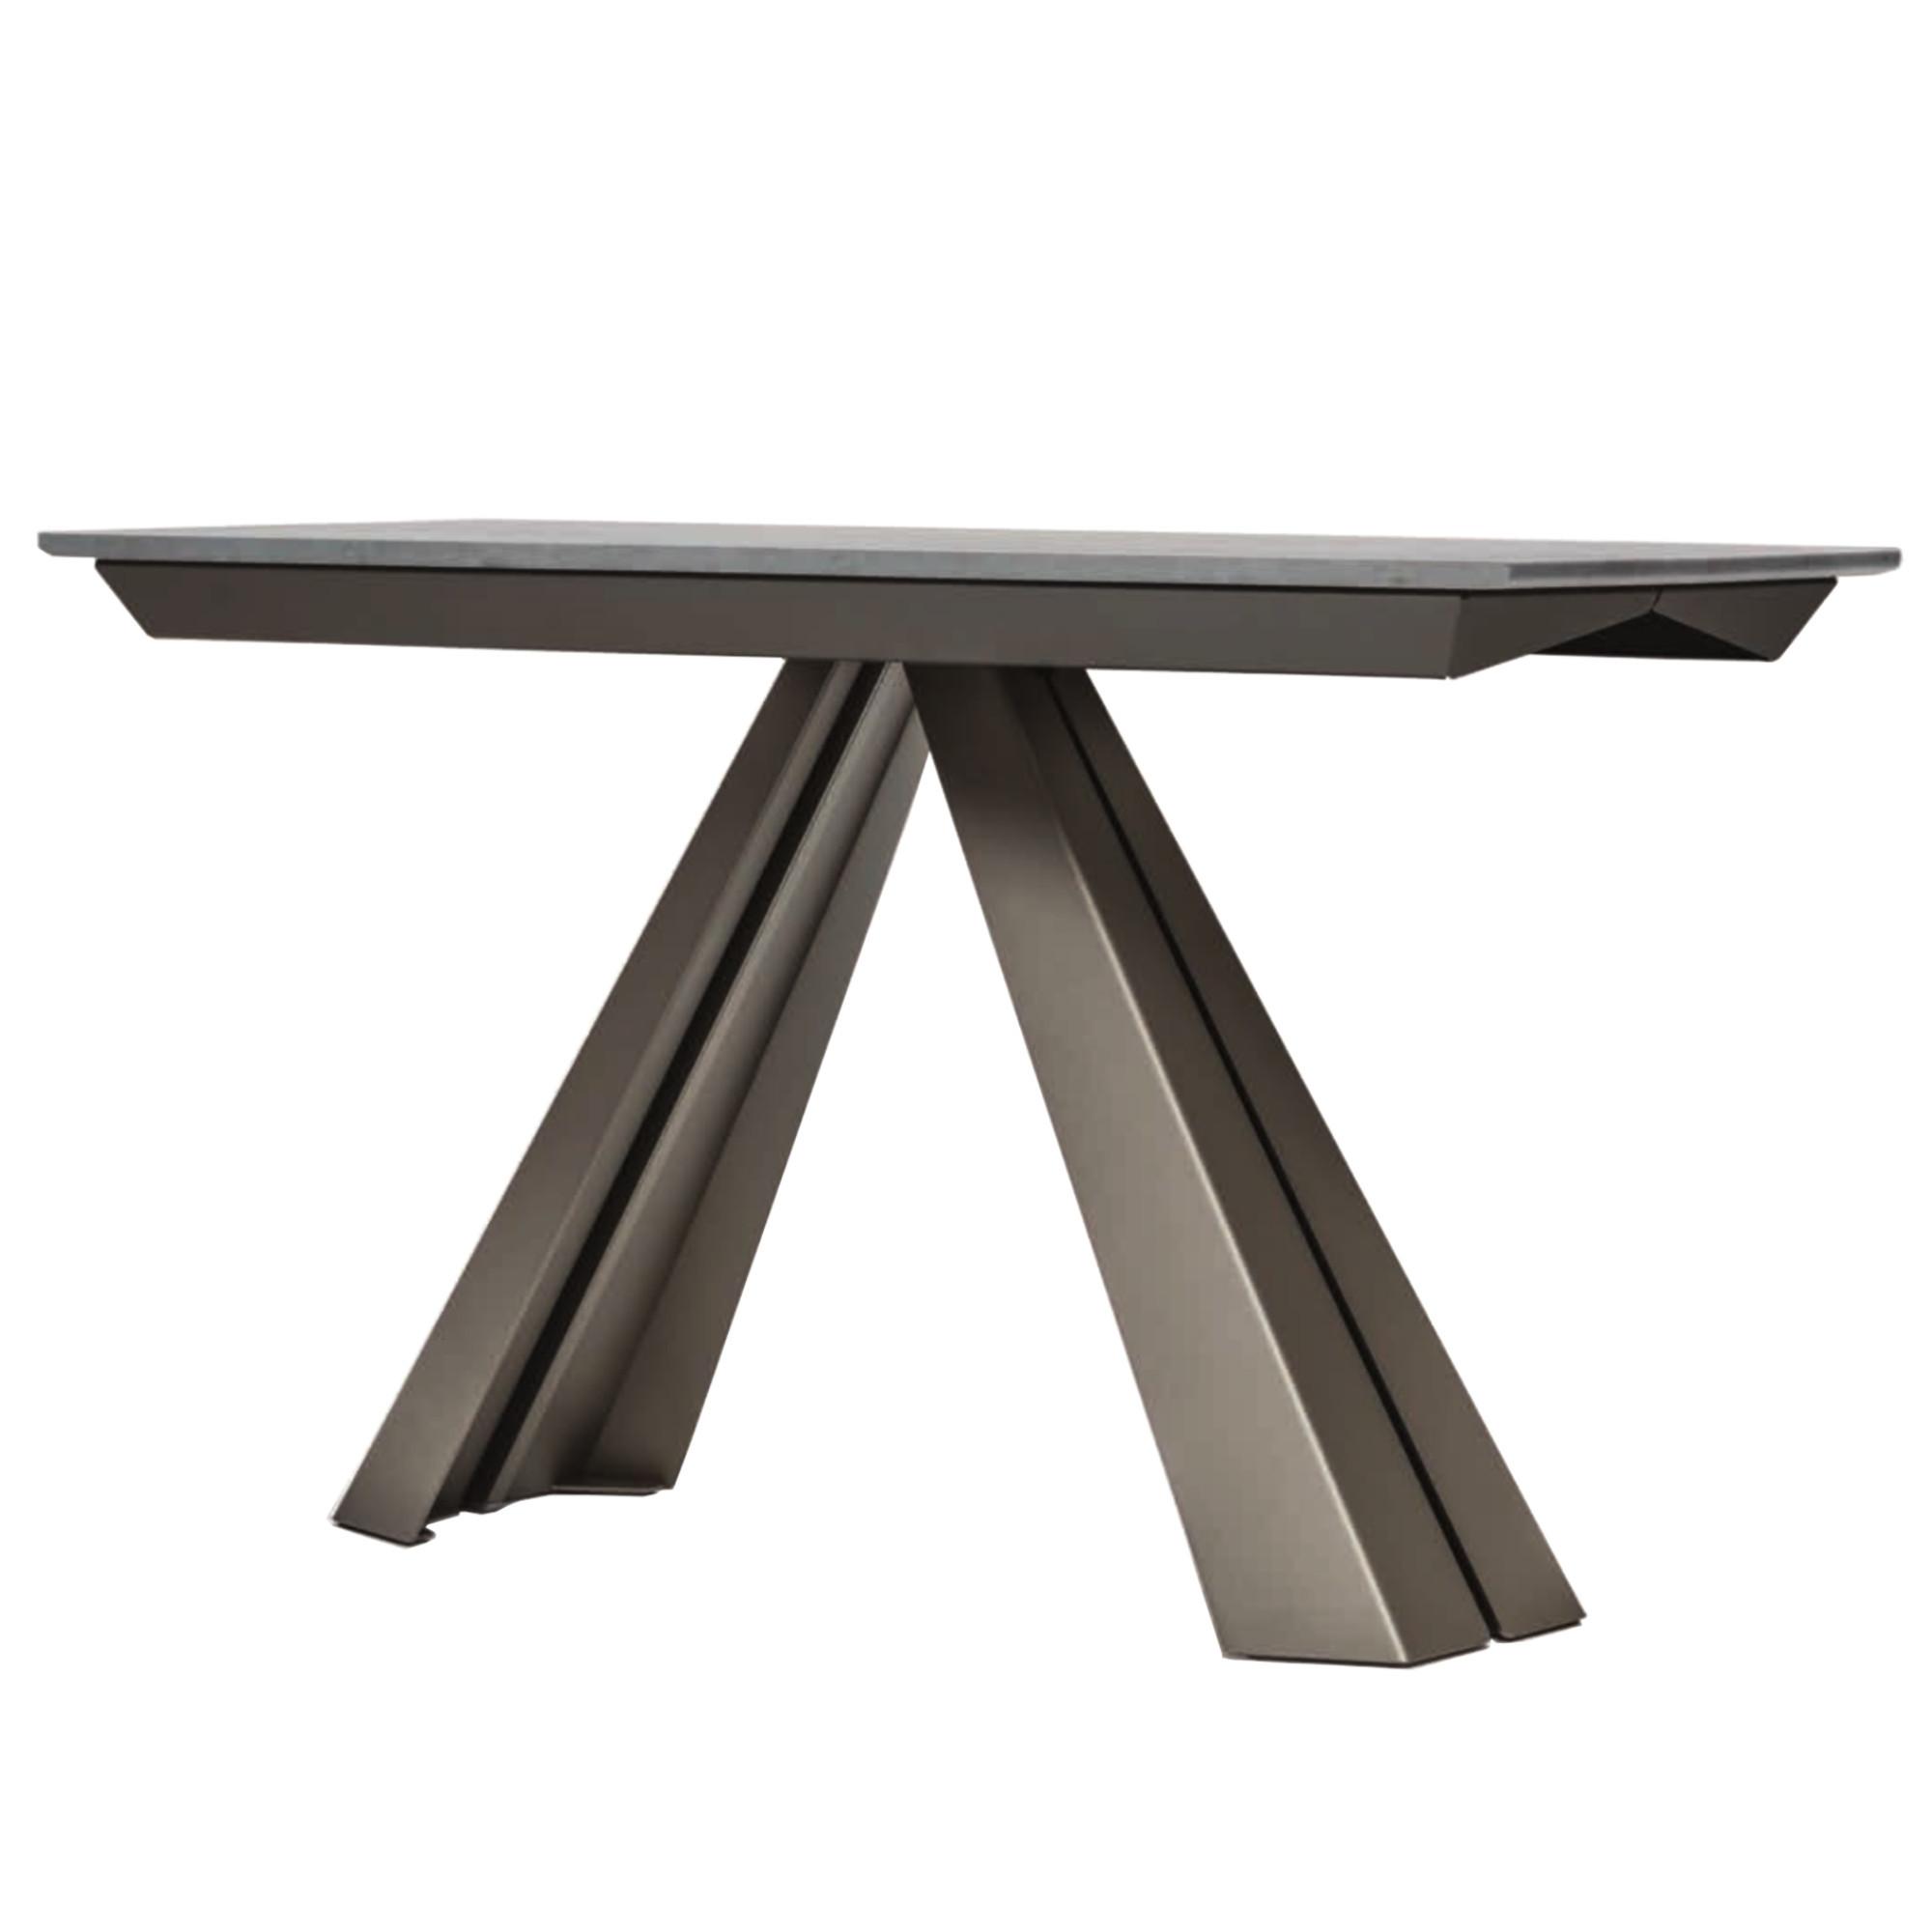 Calligaris Tavolo Consolle Allungabile Mistery.Convivium Extensible Console Extending Console Tables Tables